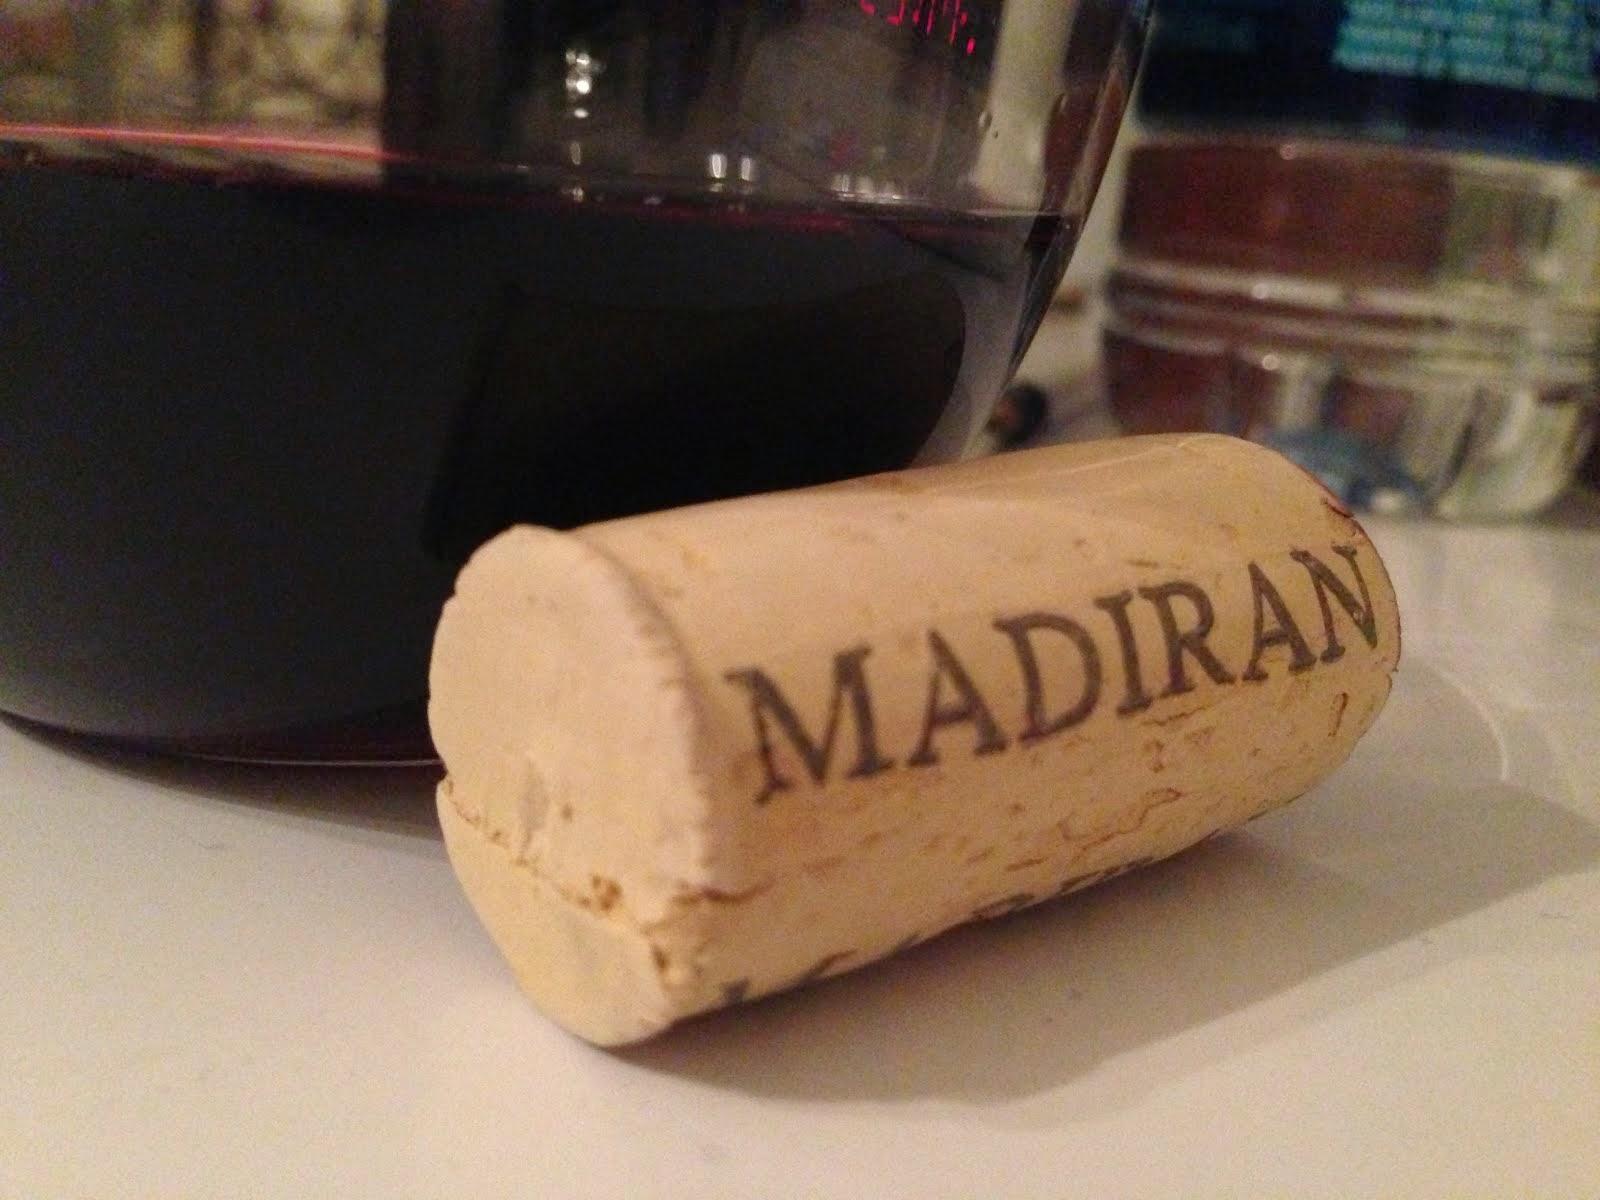 Madiran  The Wine Bar